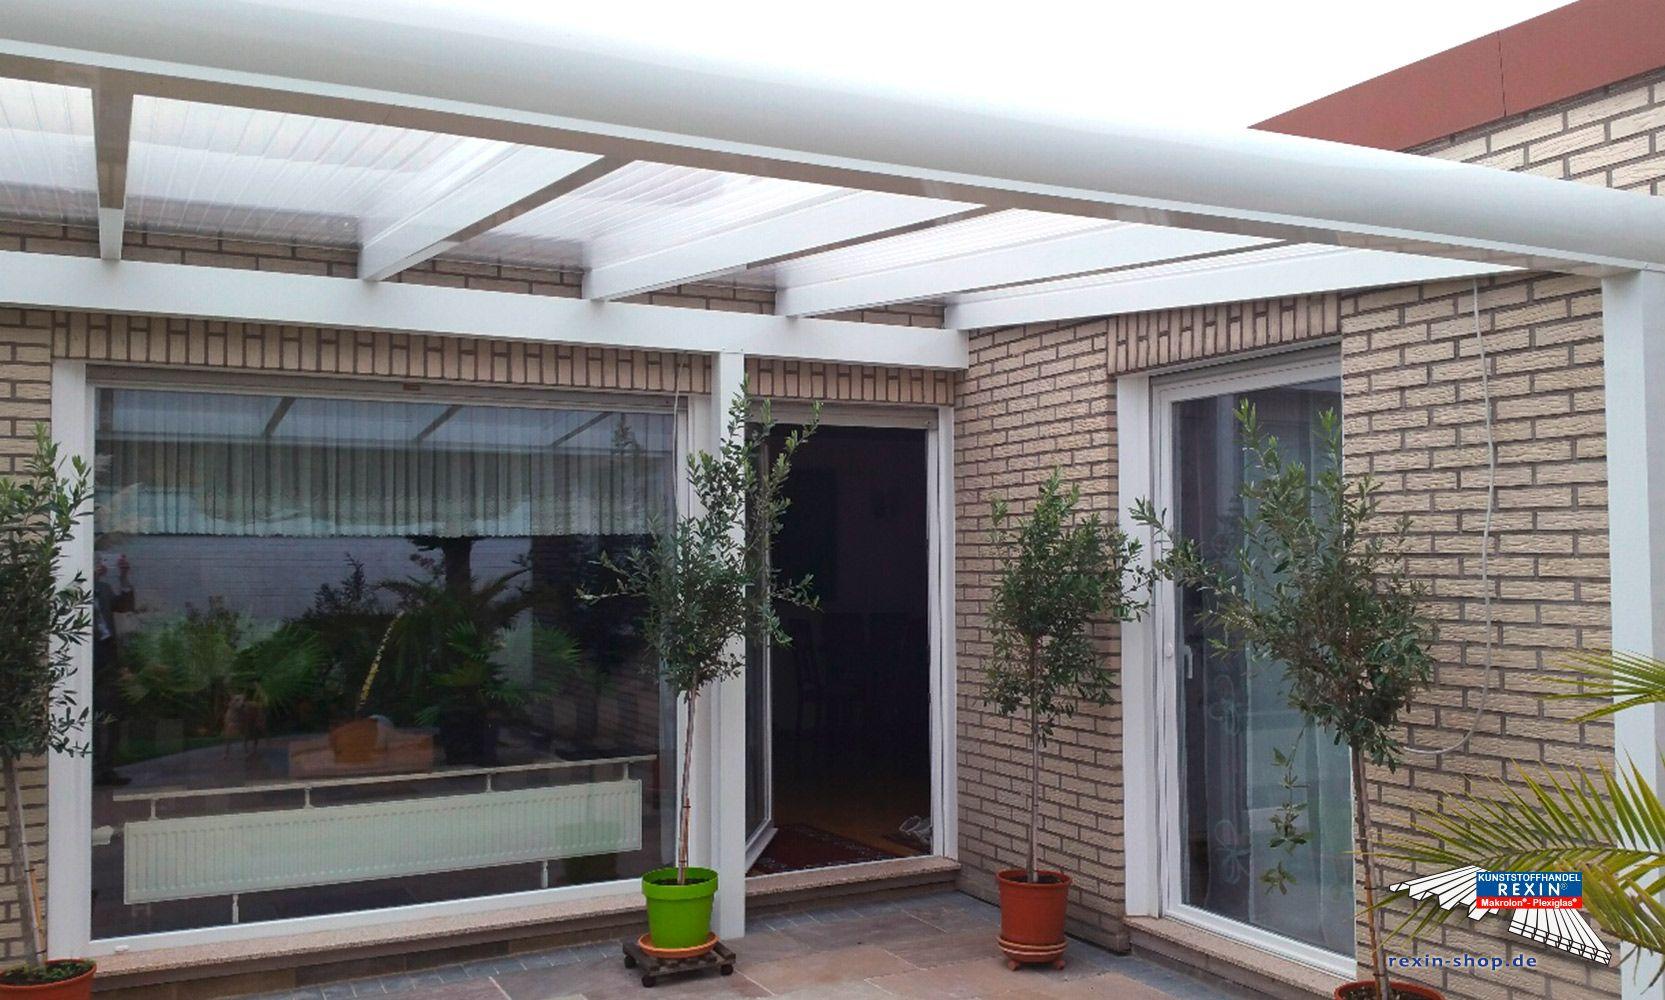 28 Ideen Fur Terrassengestaltung Dach: Terrassendesign